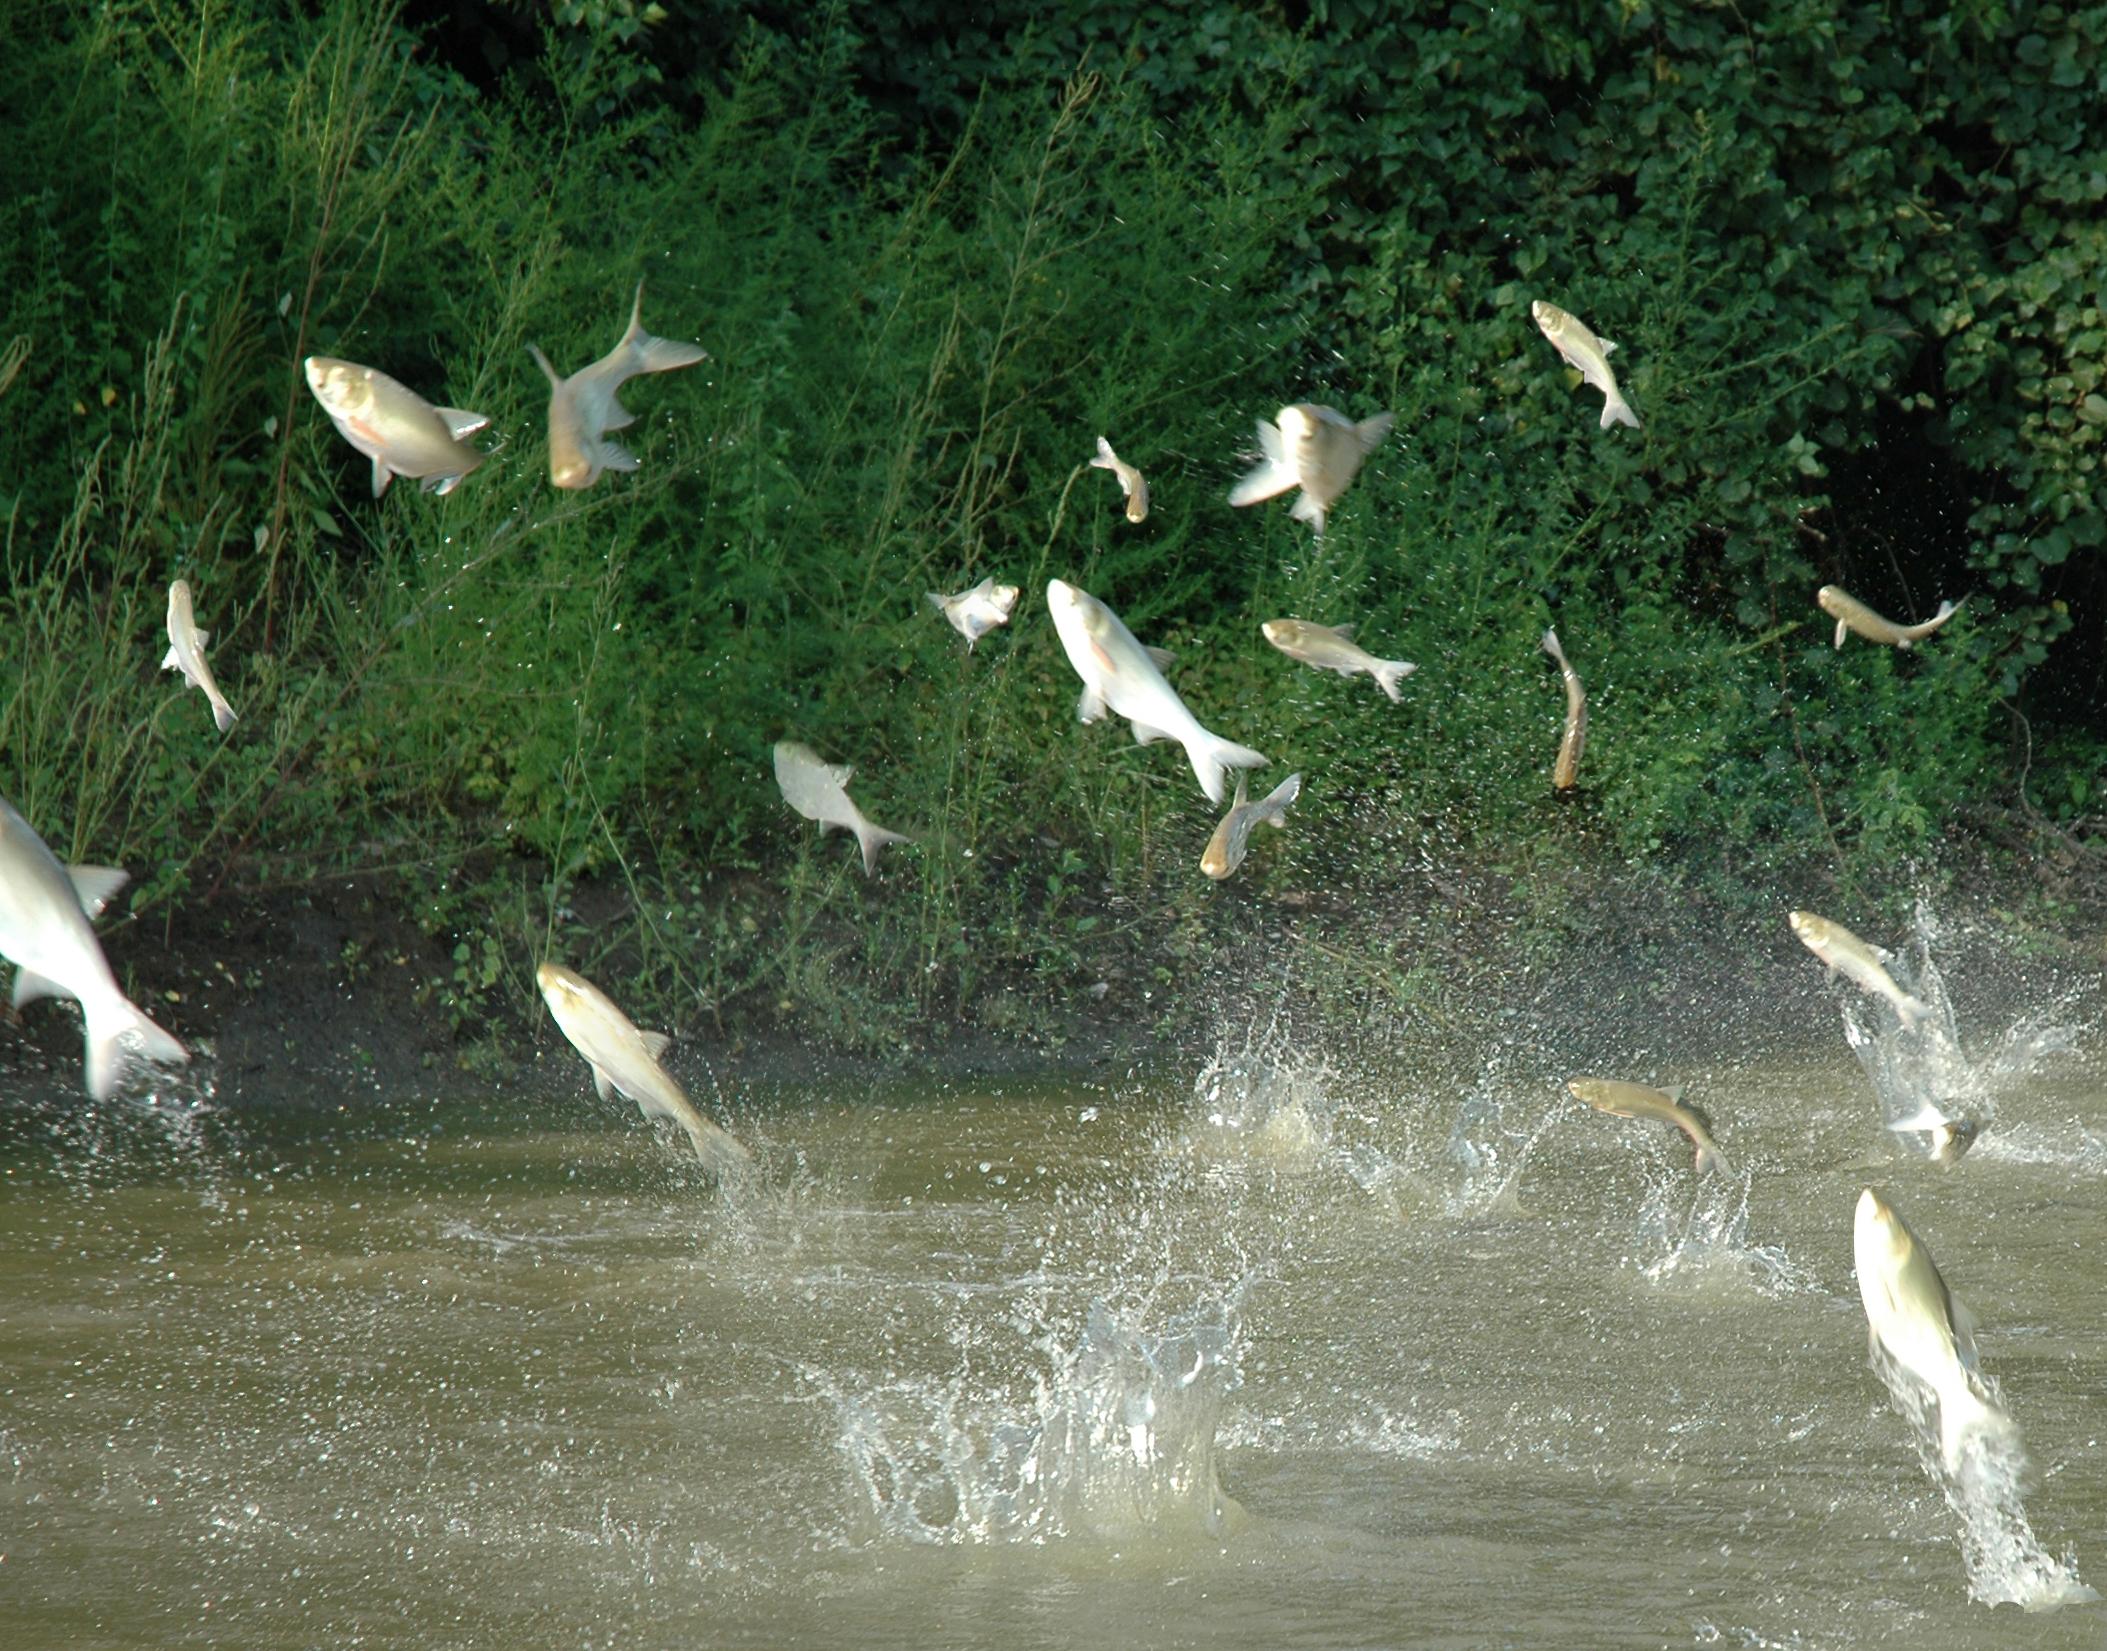 Freshwater fish jumping - Jumping Carp Source Http Www Glfc Org